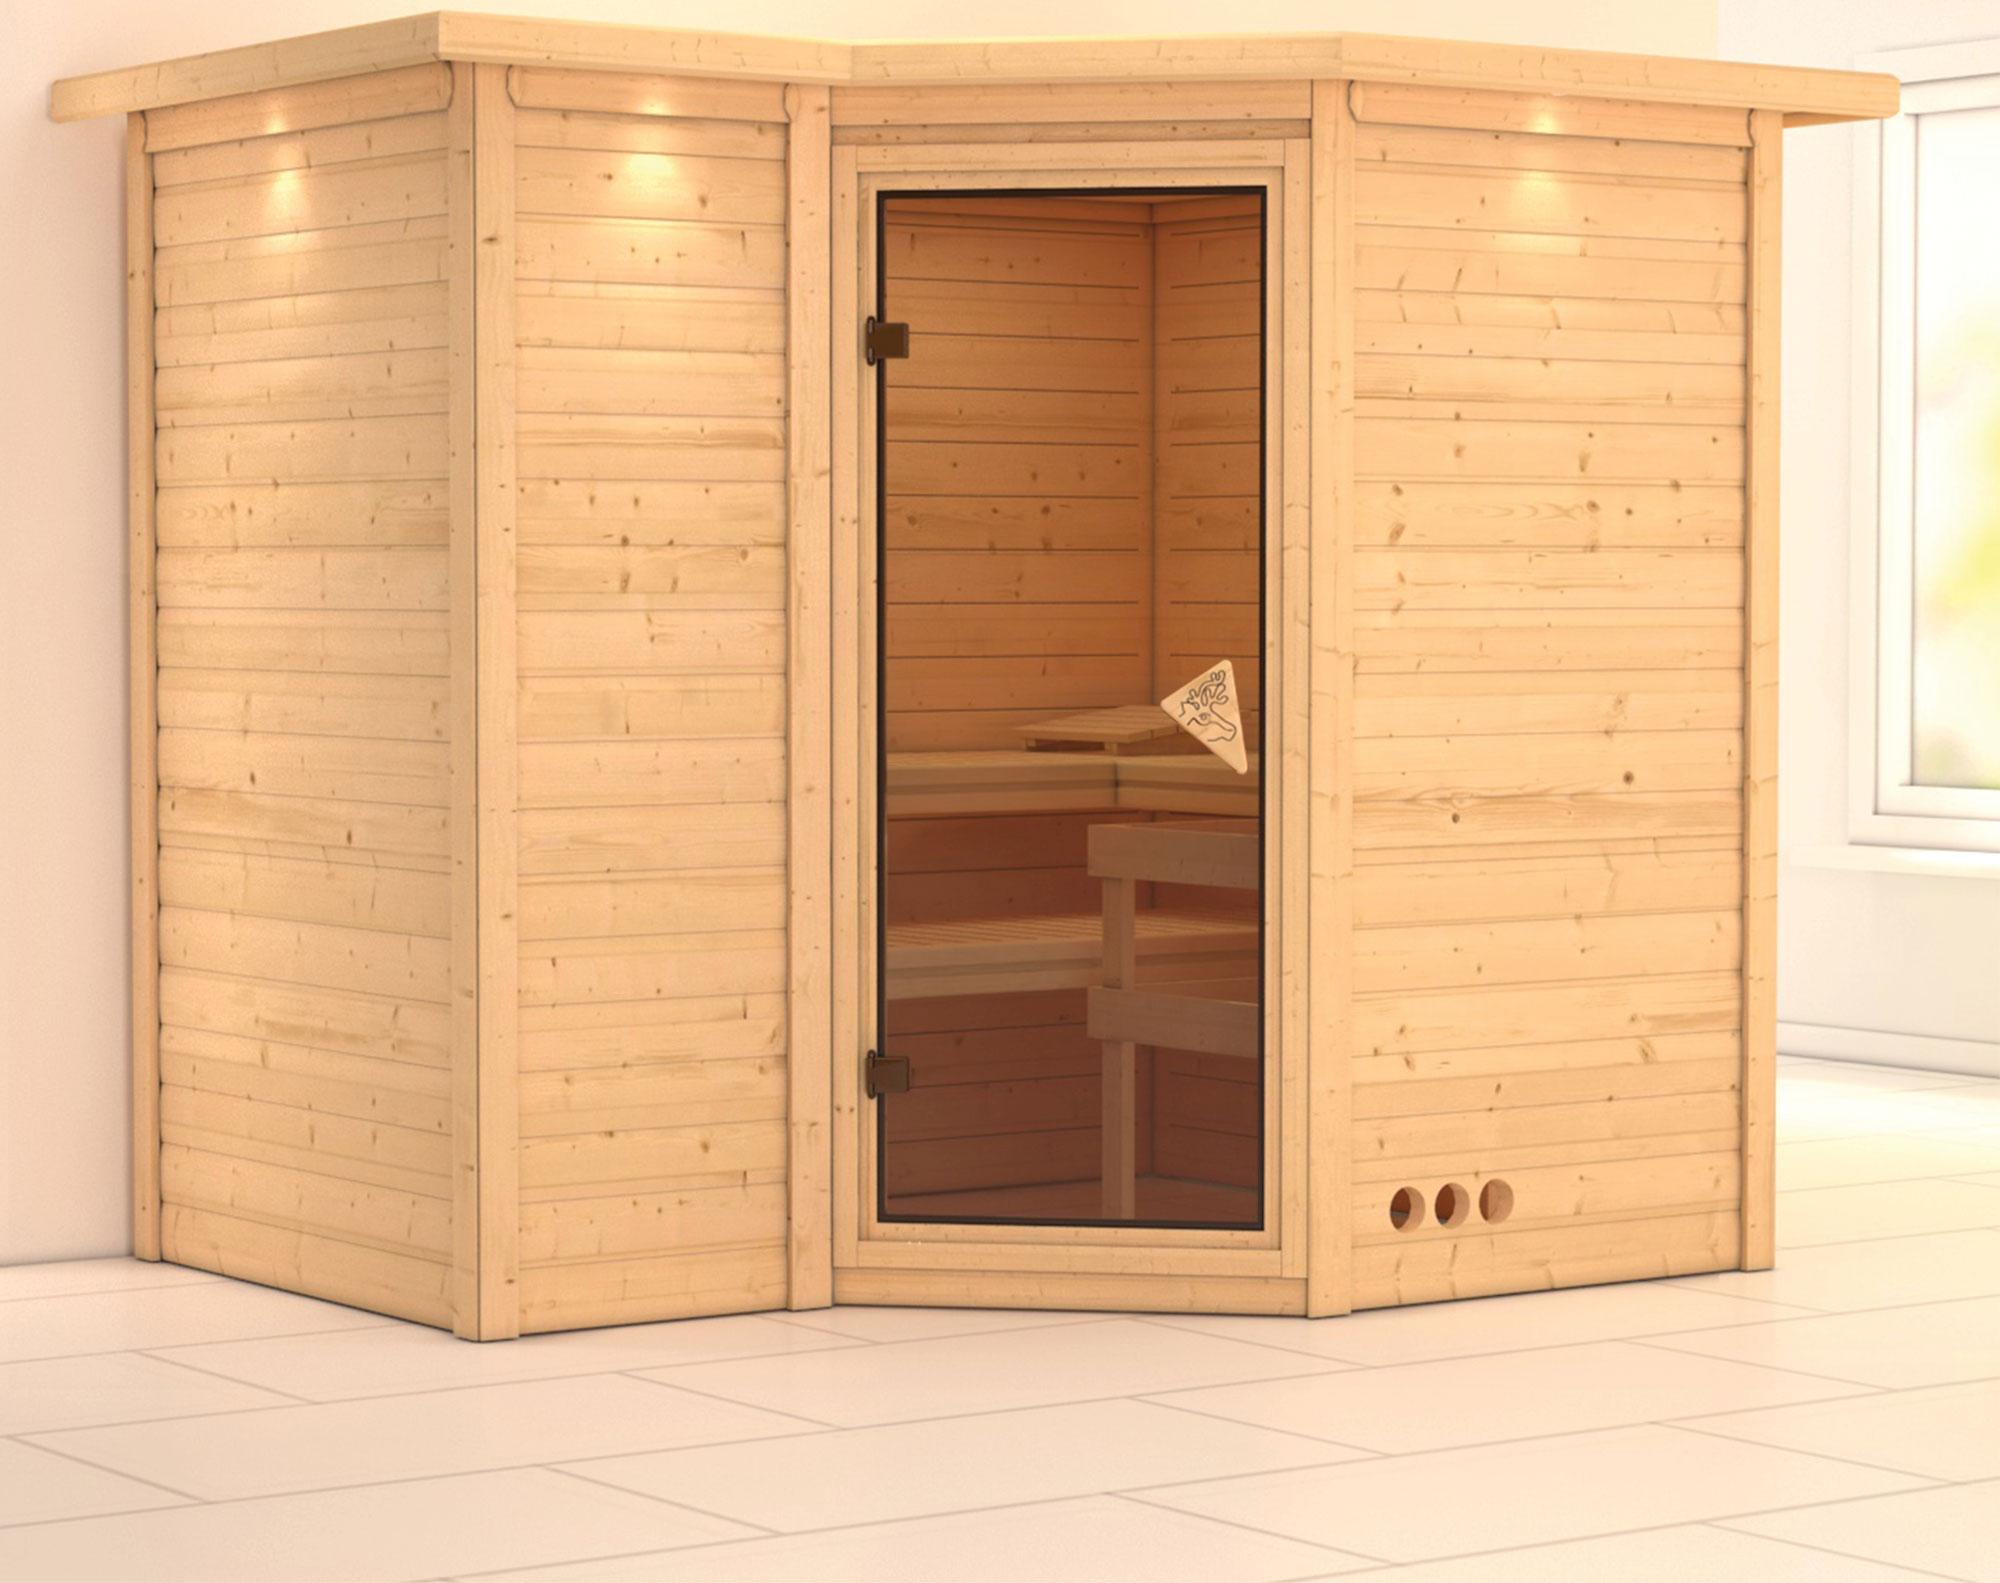 Karibu Sauna Sahib 2 40mm Dachkranz ohne Ofen classic Tür Bild 1